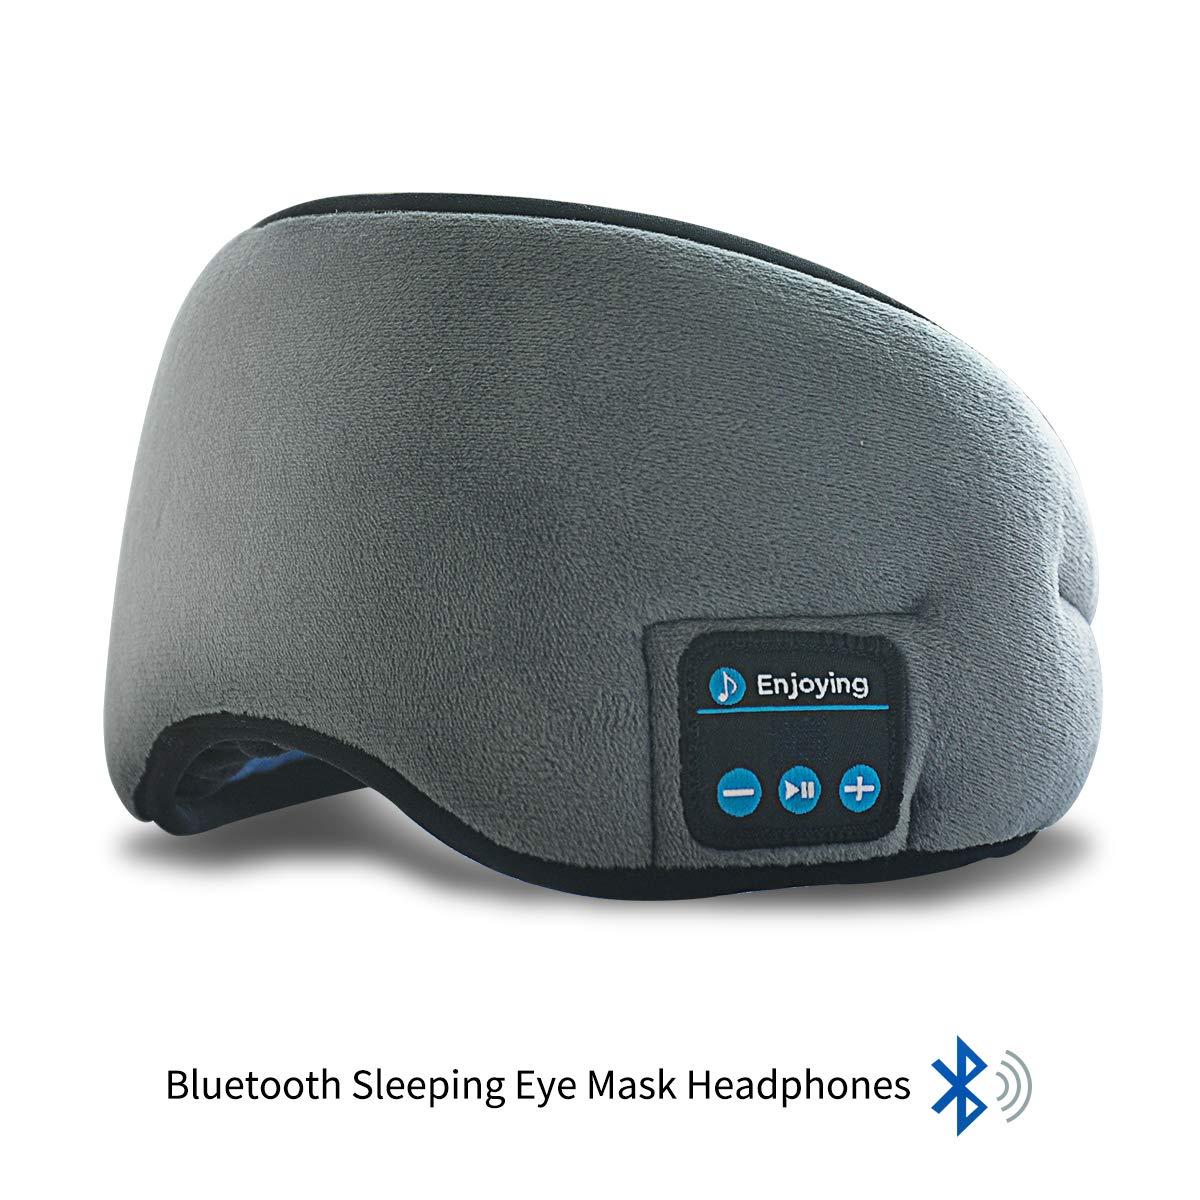 Bluetooth Sleeping Eye Mask Headphones,ERNSTING-4.2 Wireless Bluetooth Headset Music Travel Sleep Headset Built-in Microphone is Adjustable and Washable,Perfect for Travel & Sleeping (Grey)